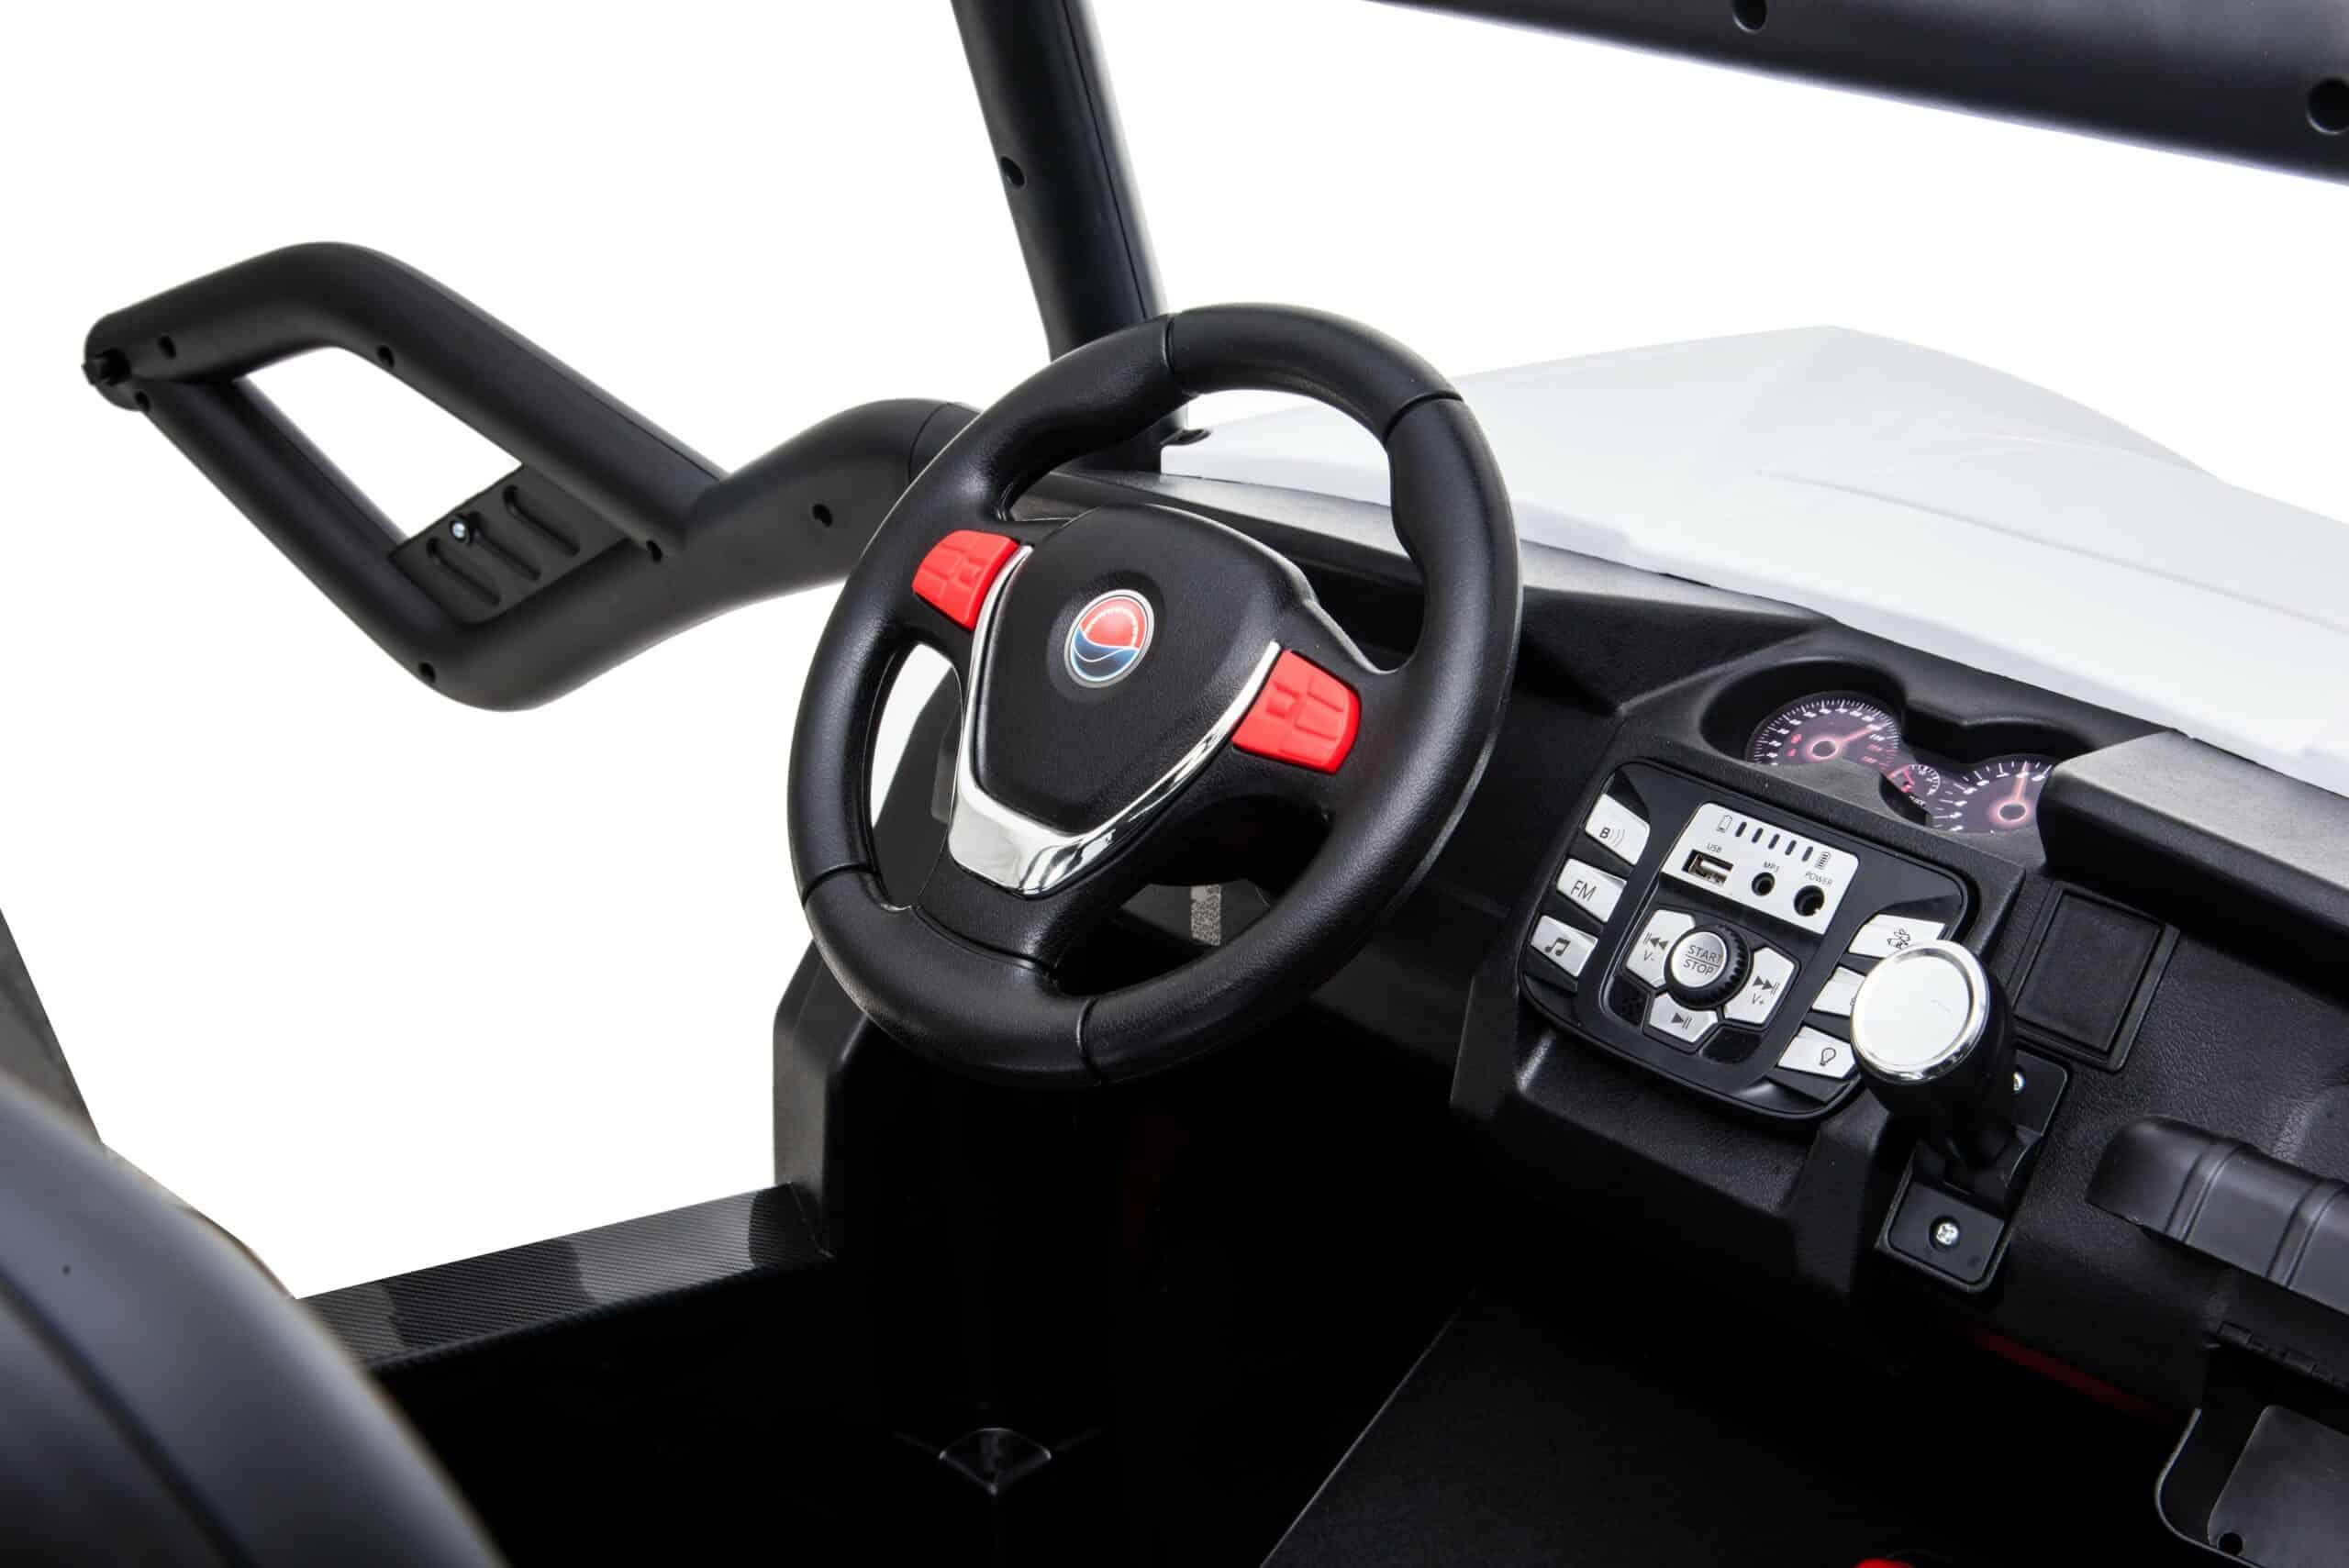 Renegade Maverick Rs 24v* 4×4 Kids Electric Ride On Buggy – White